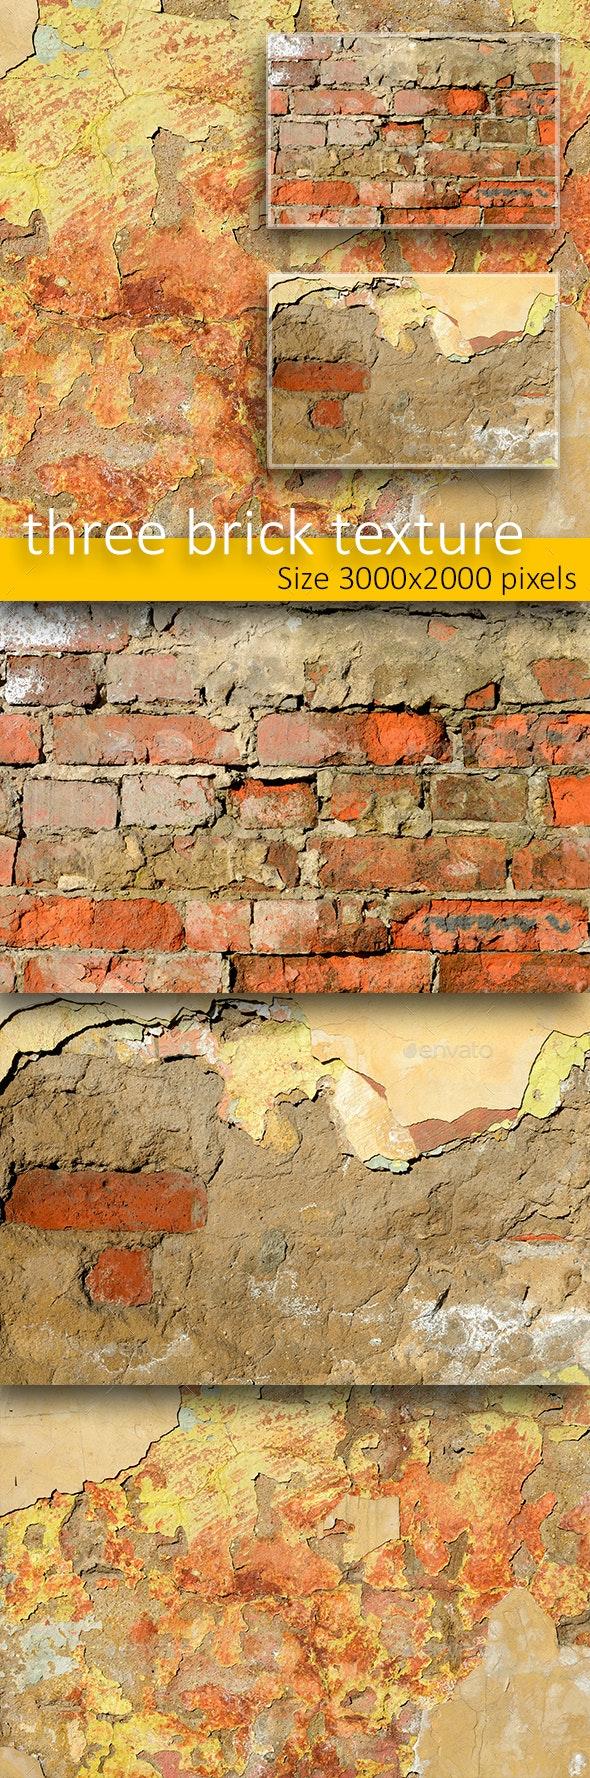 Brick texture 5 - Stone Textures